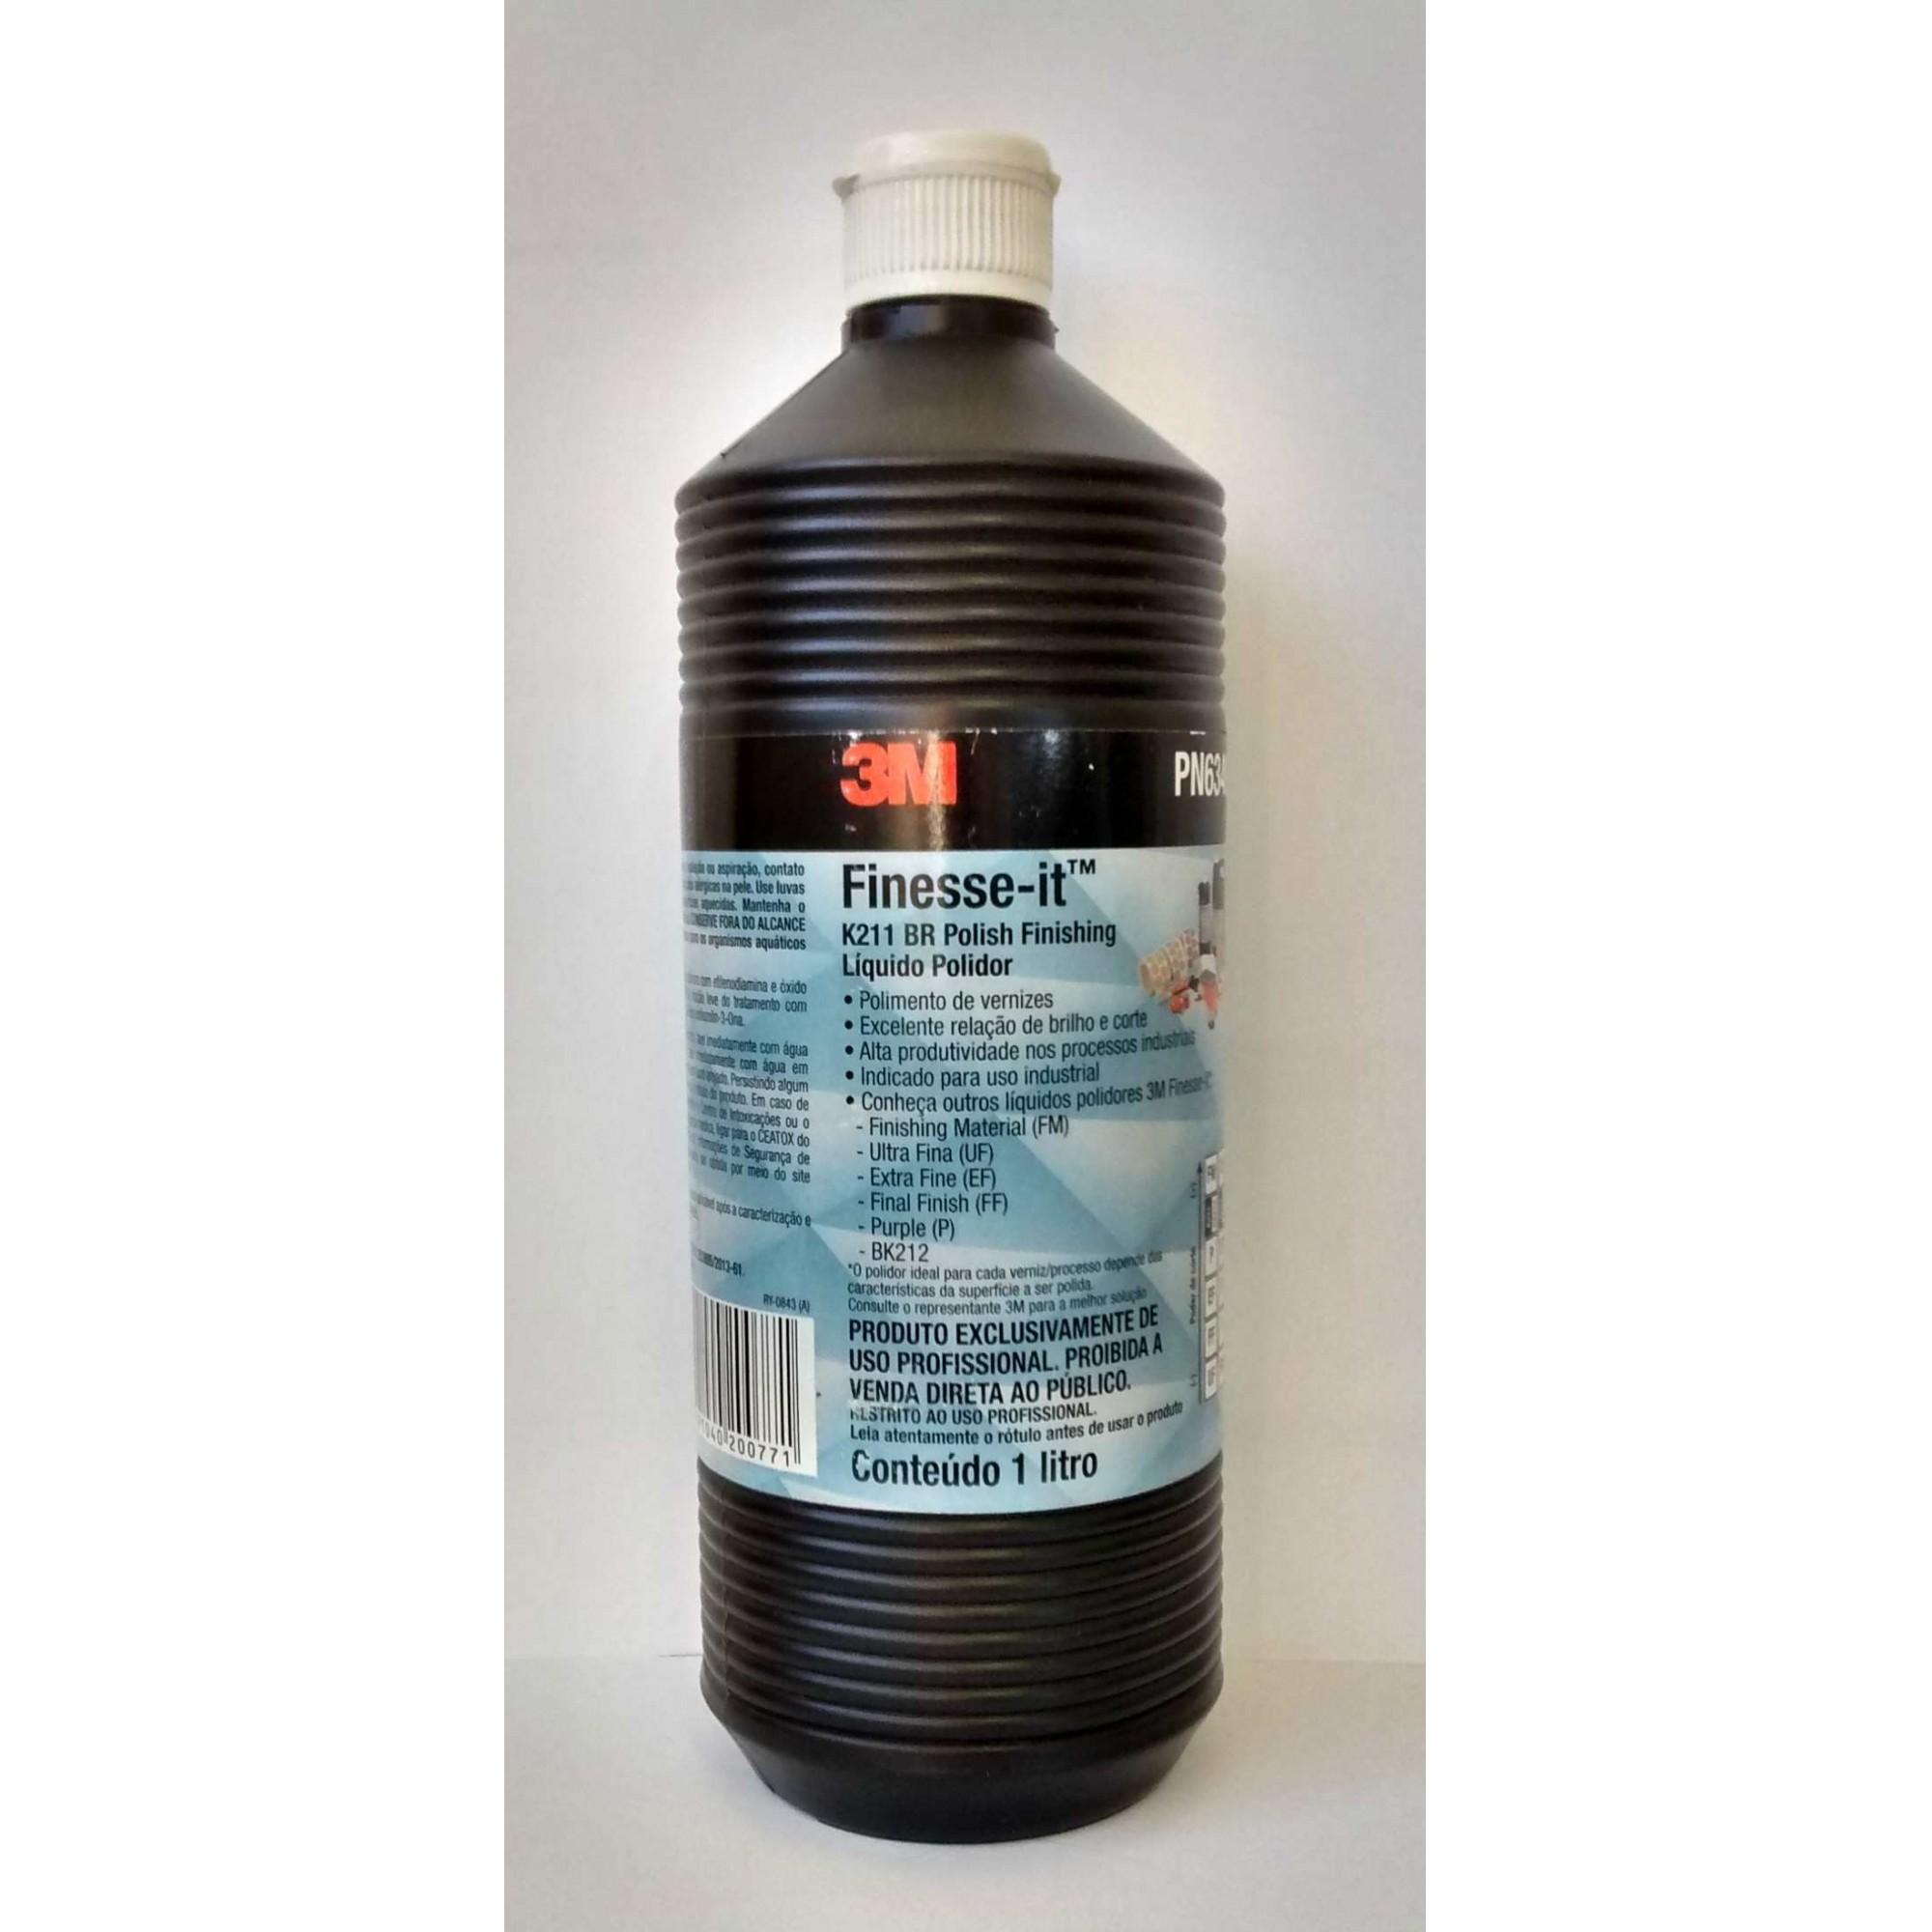 Líquido Polidor BK212 Finesse-it 1L PN00212 - 3M